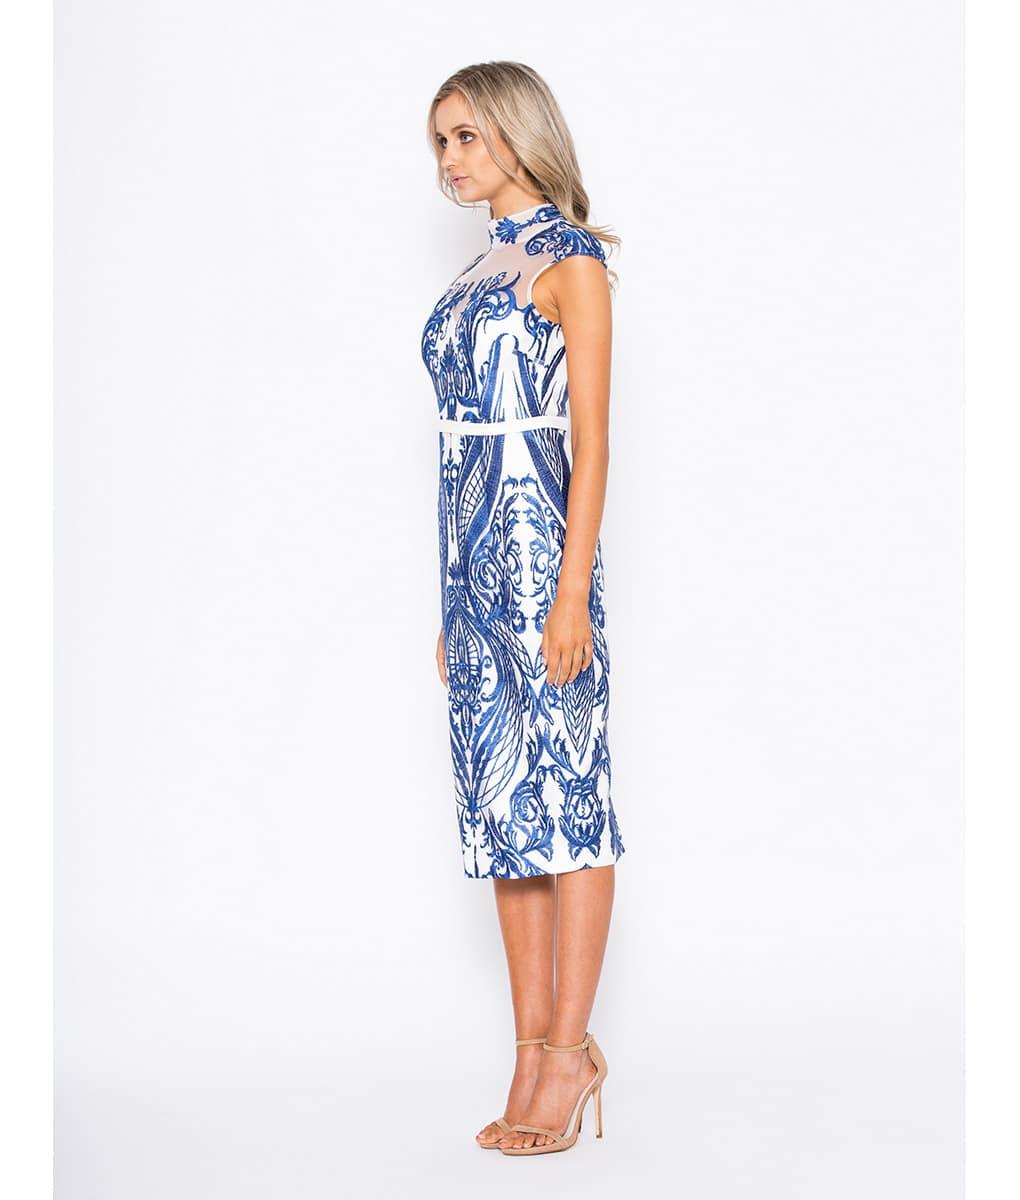 Alila-White-and-sapphire-Tailored-Midi-Races-Dress-Bariano